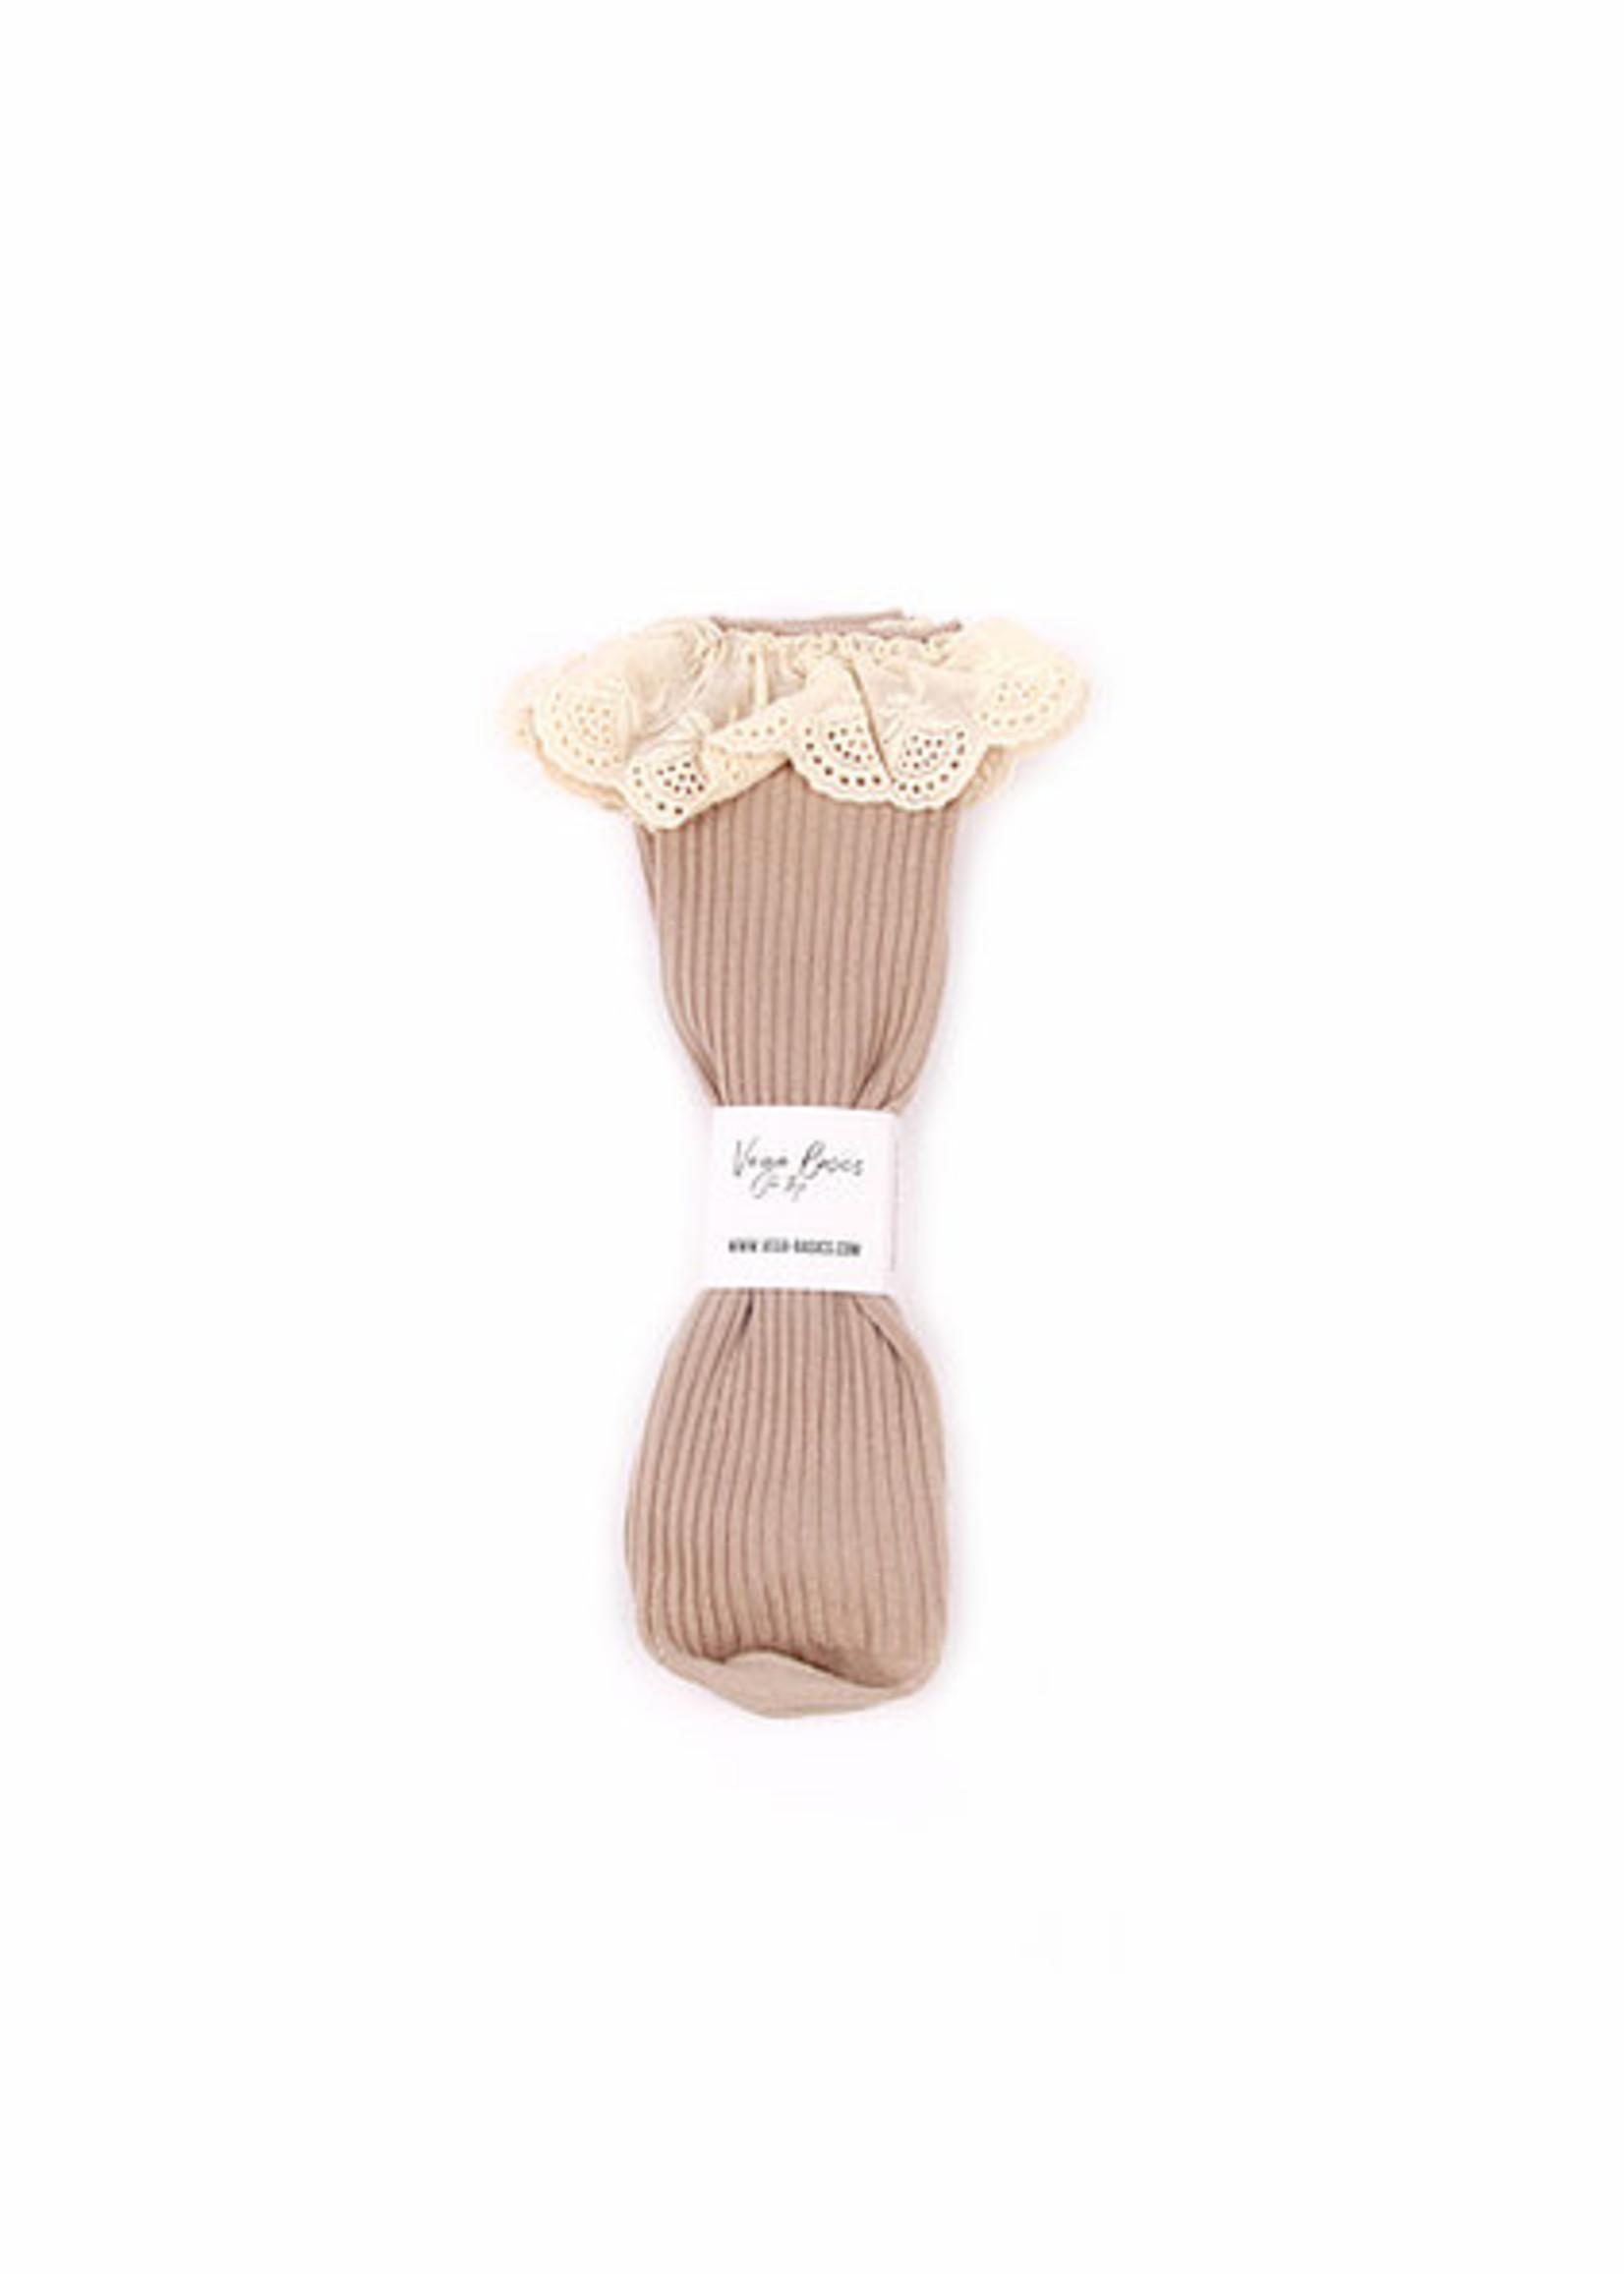 Vega Basics The Emilia Socks - Mokka